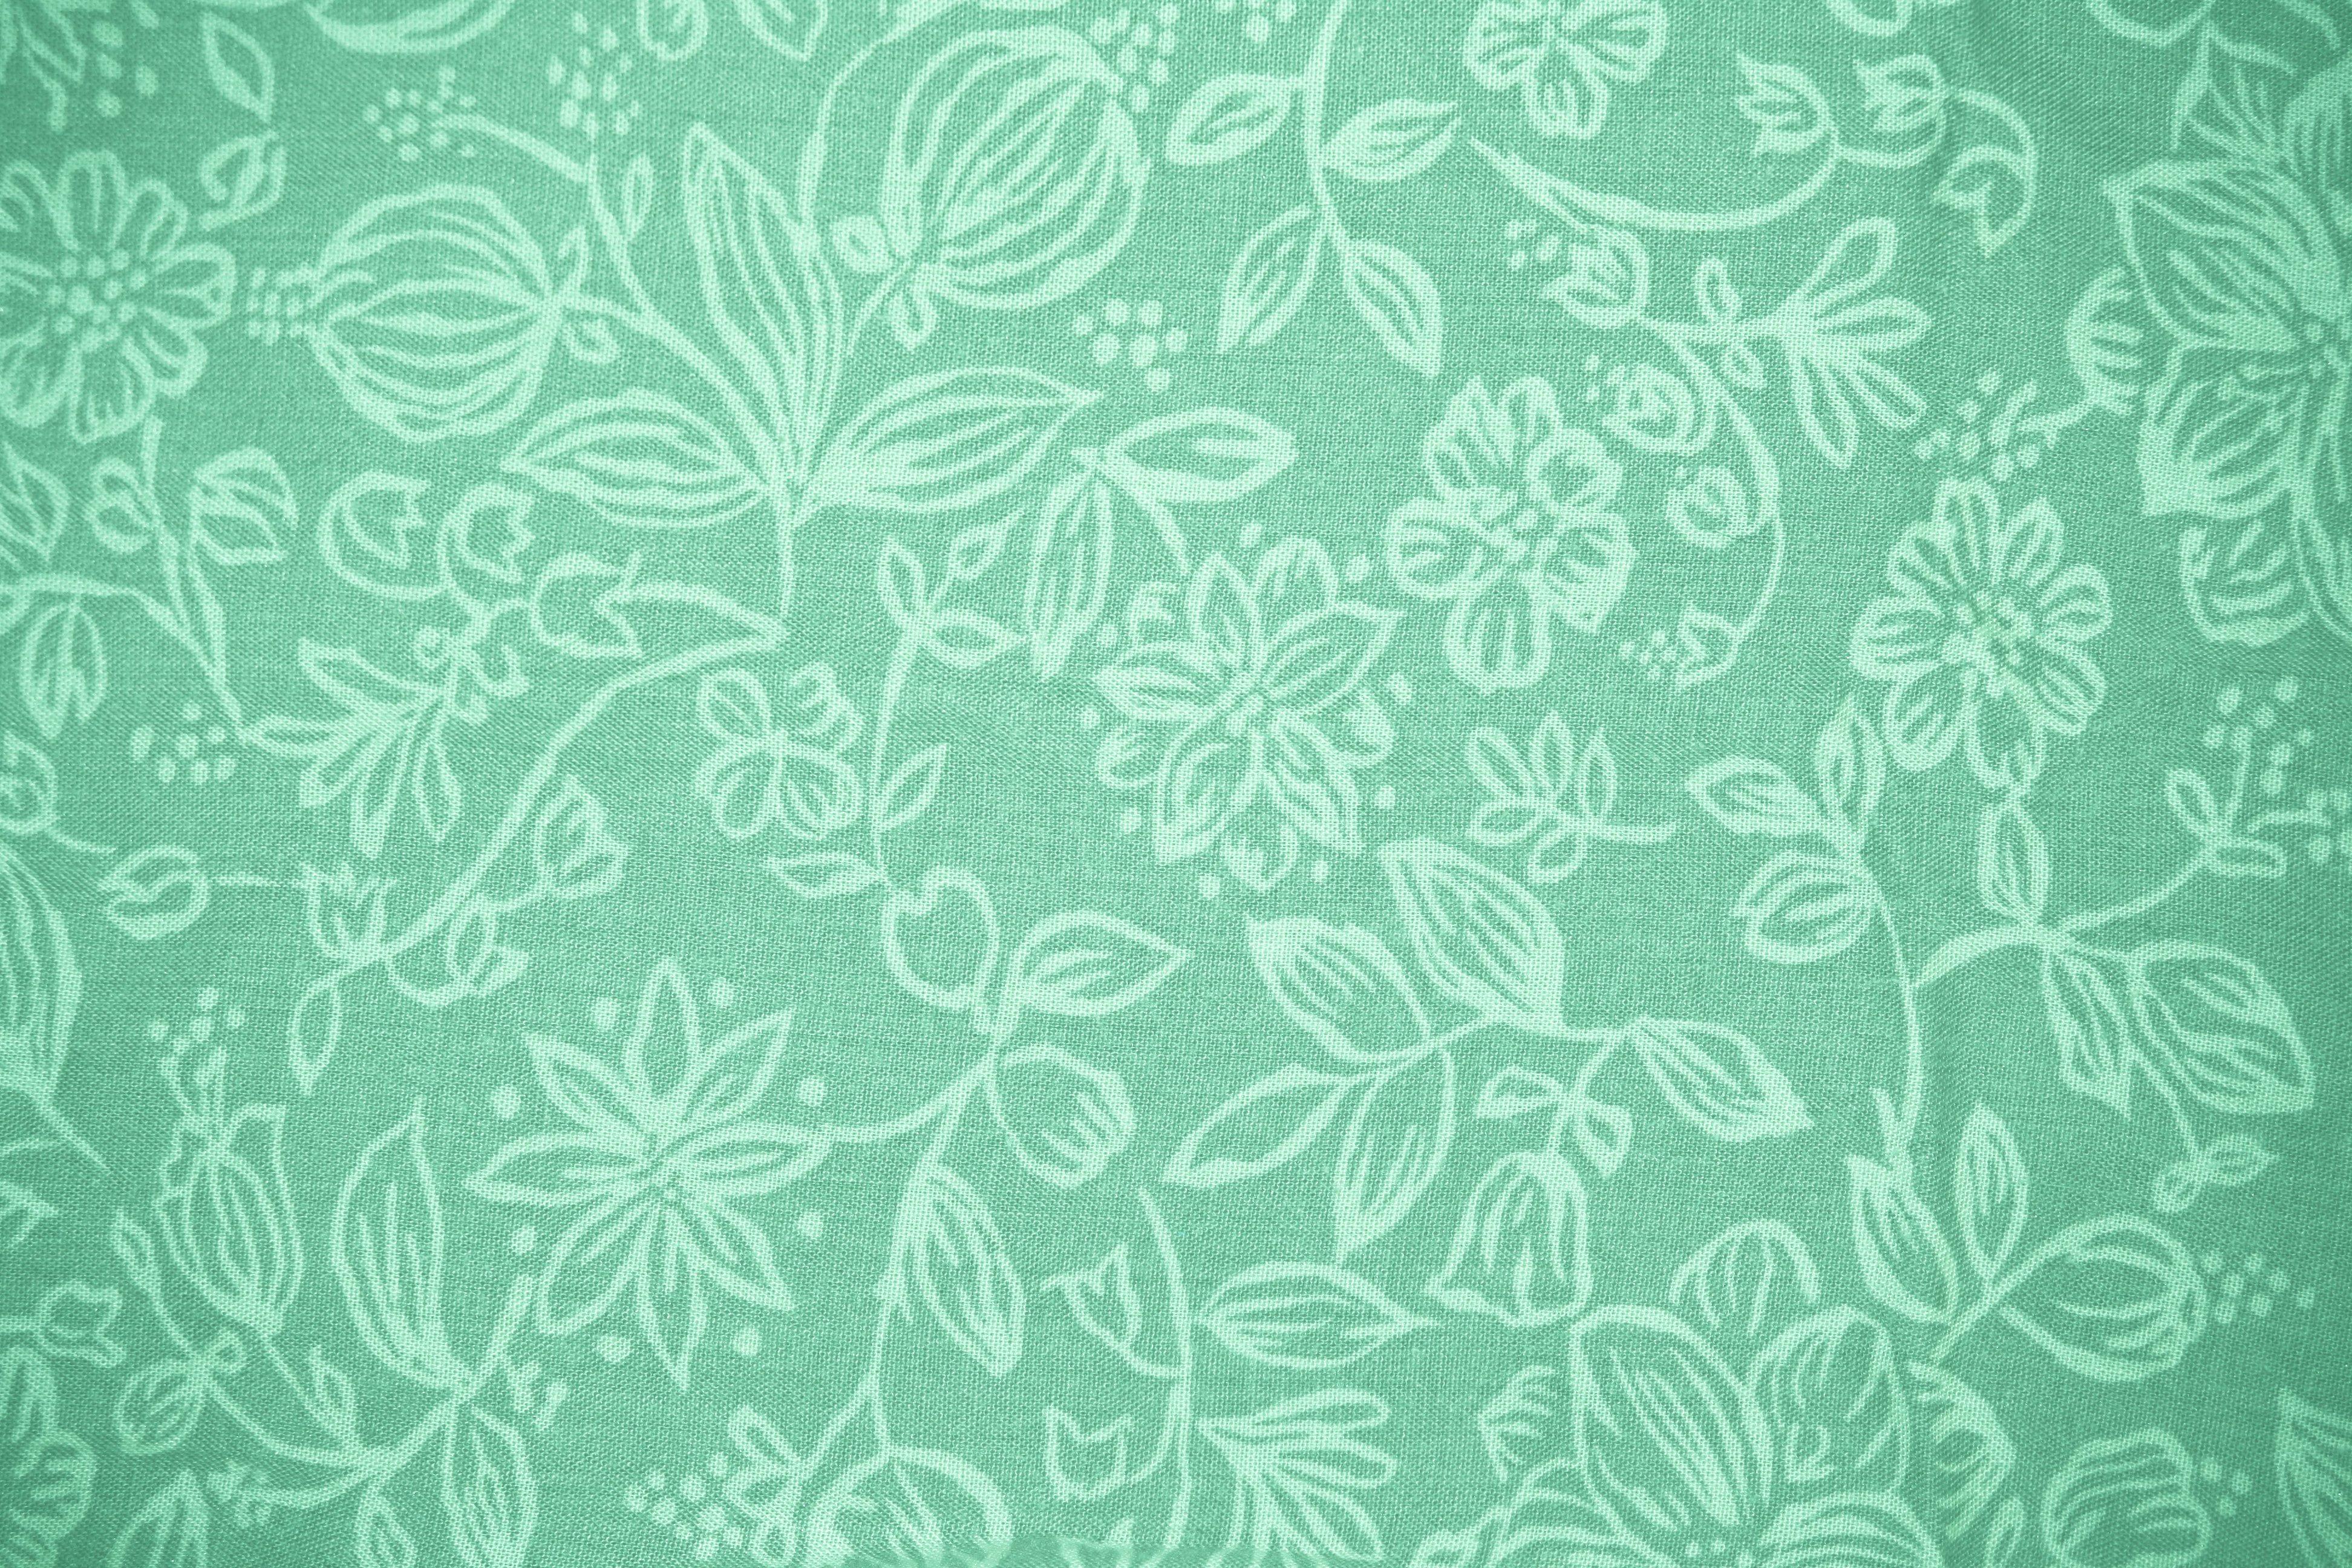 Wallpaper Hd For Desktop Full Screen Quotes Mint Green Wallpapers Pixelstalk Net